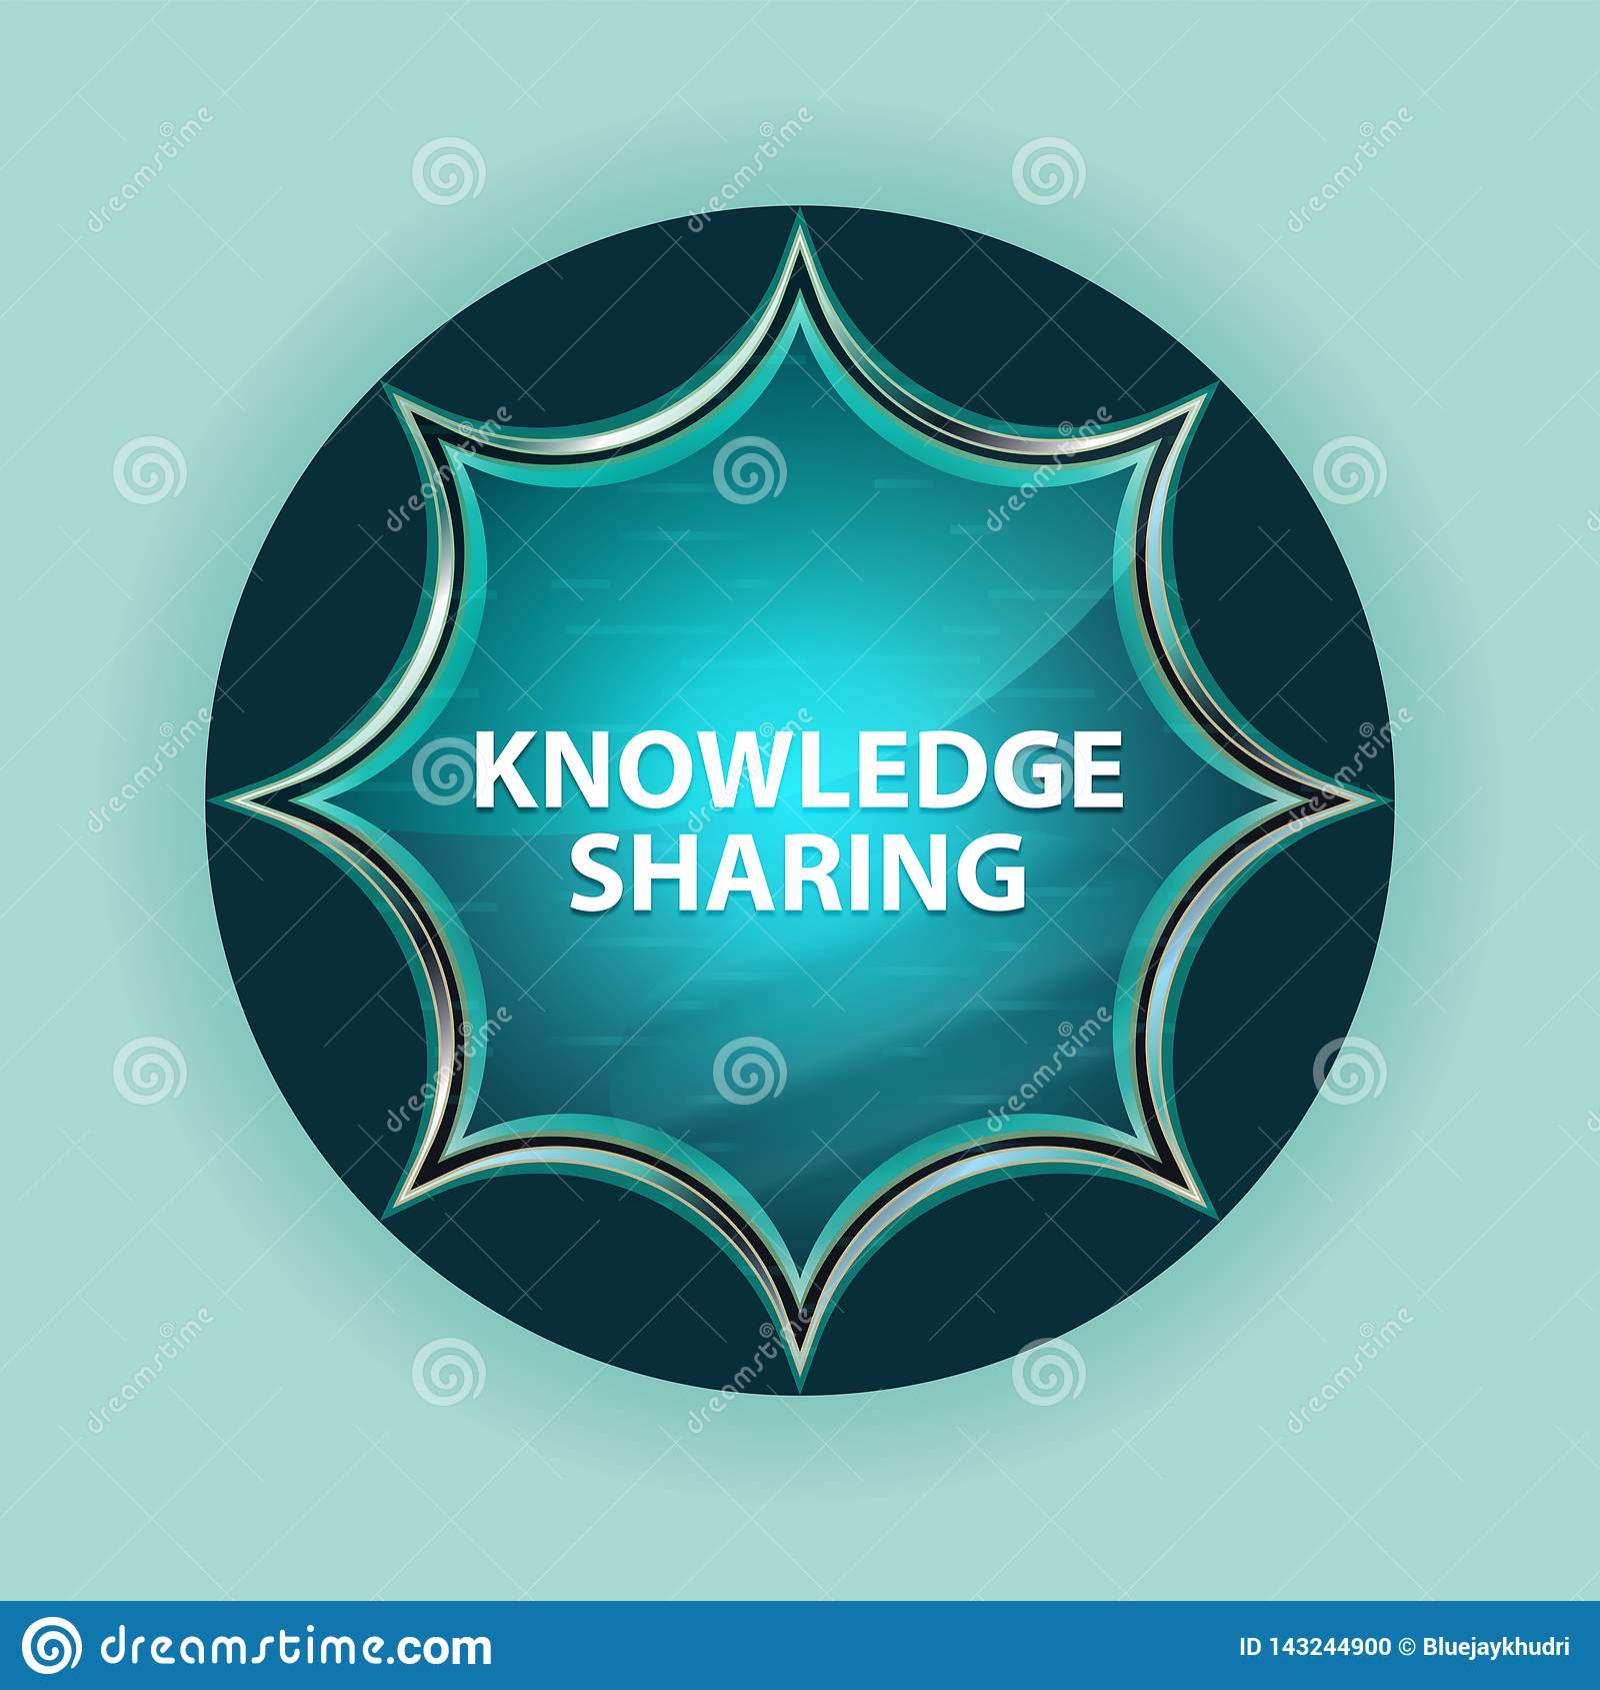 Knowledge Sharing magical glassy sunburst blue button sky blue background